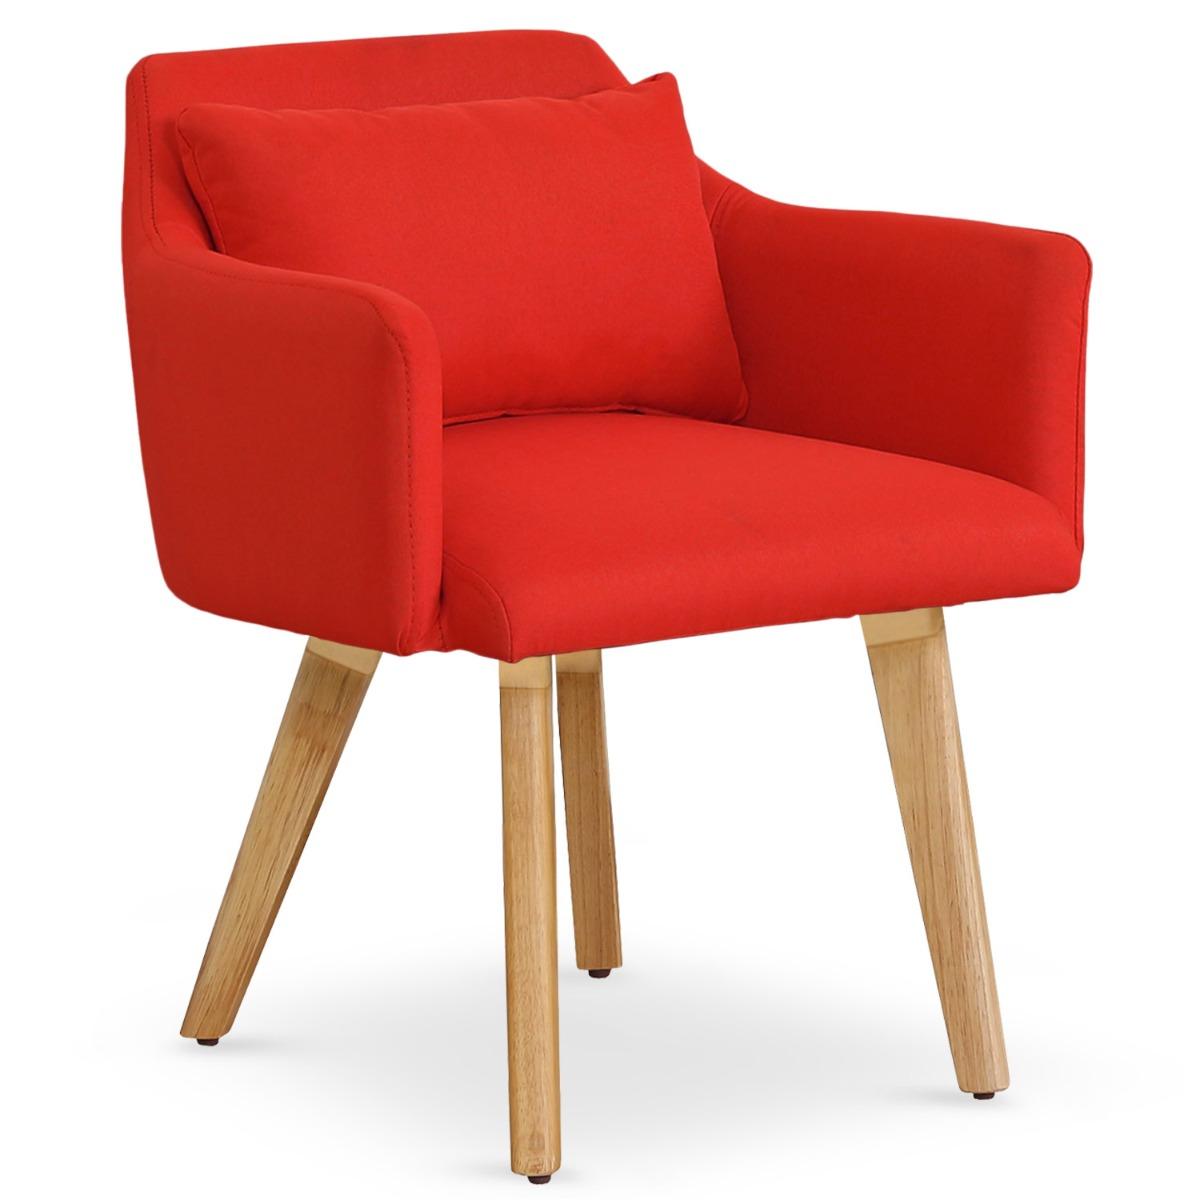 Lot de 20 chaises / fauteuils scandinaves Gybson Tissu Rouge